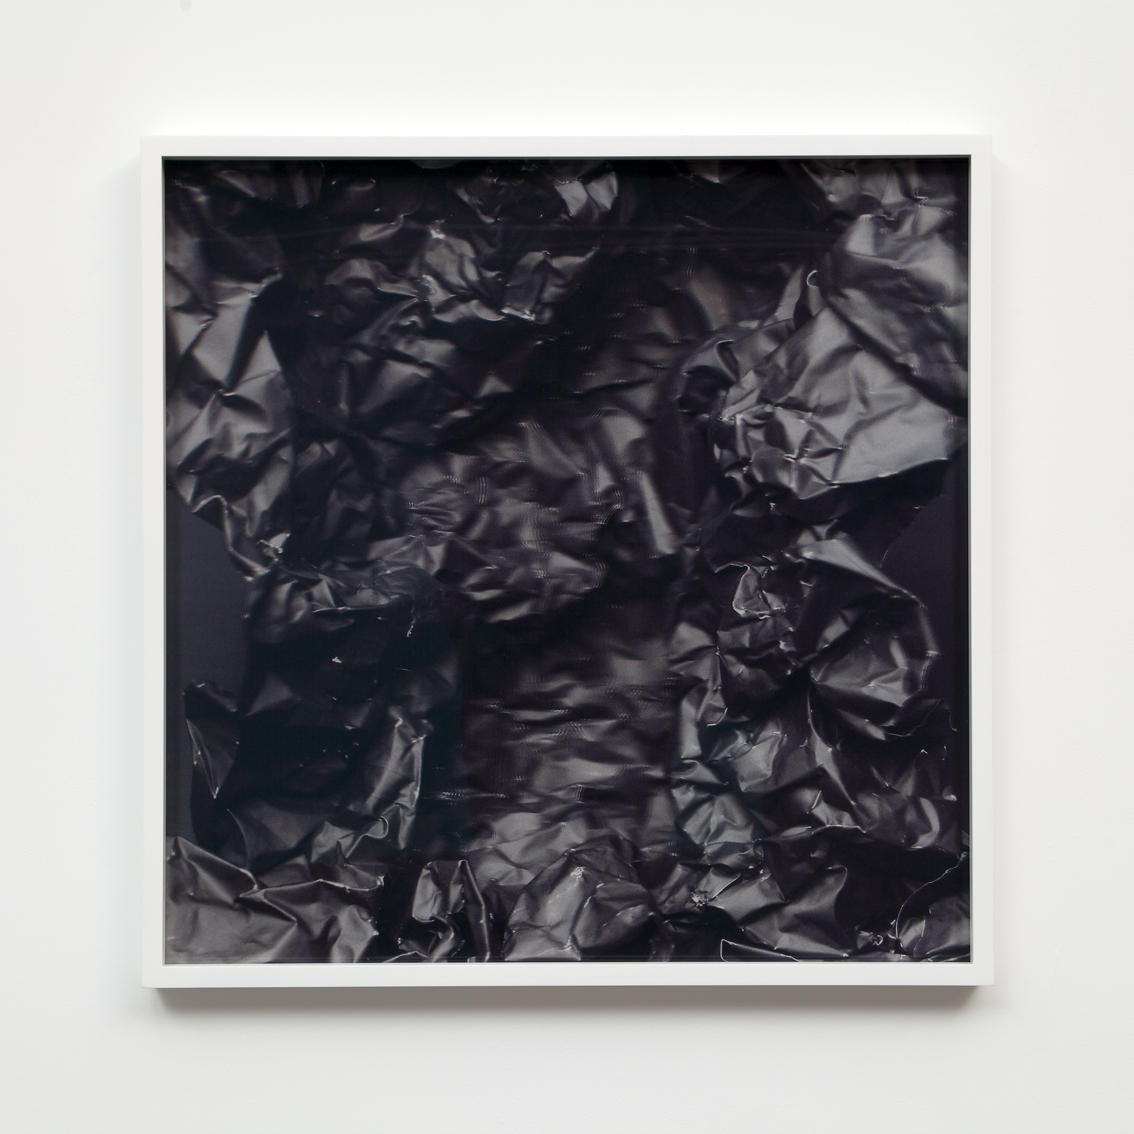 Foil (black) I  3D lenticular photograph 60x60 cm.